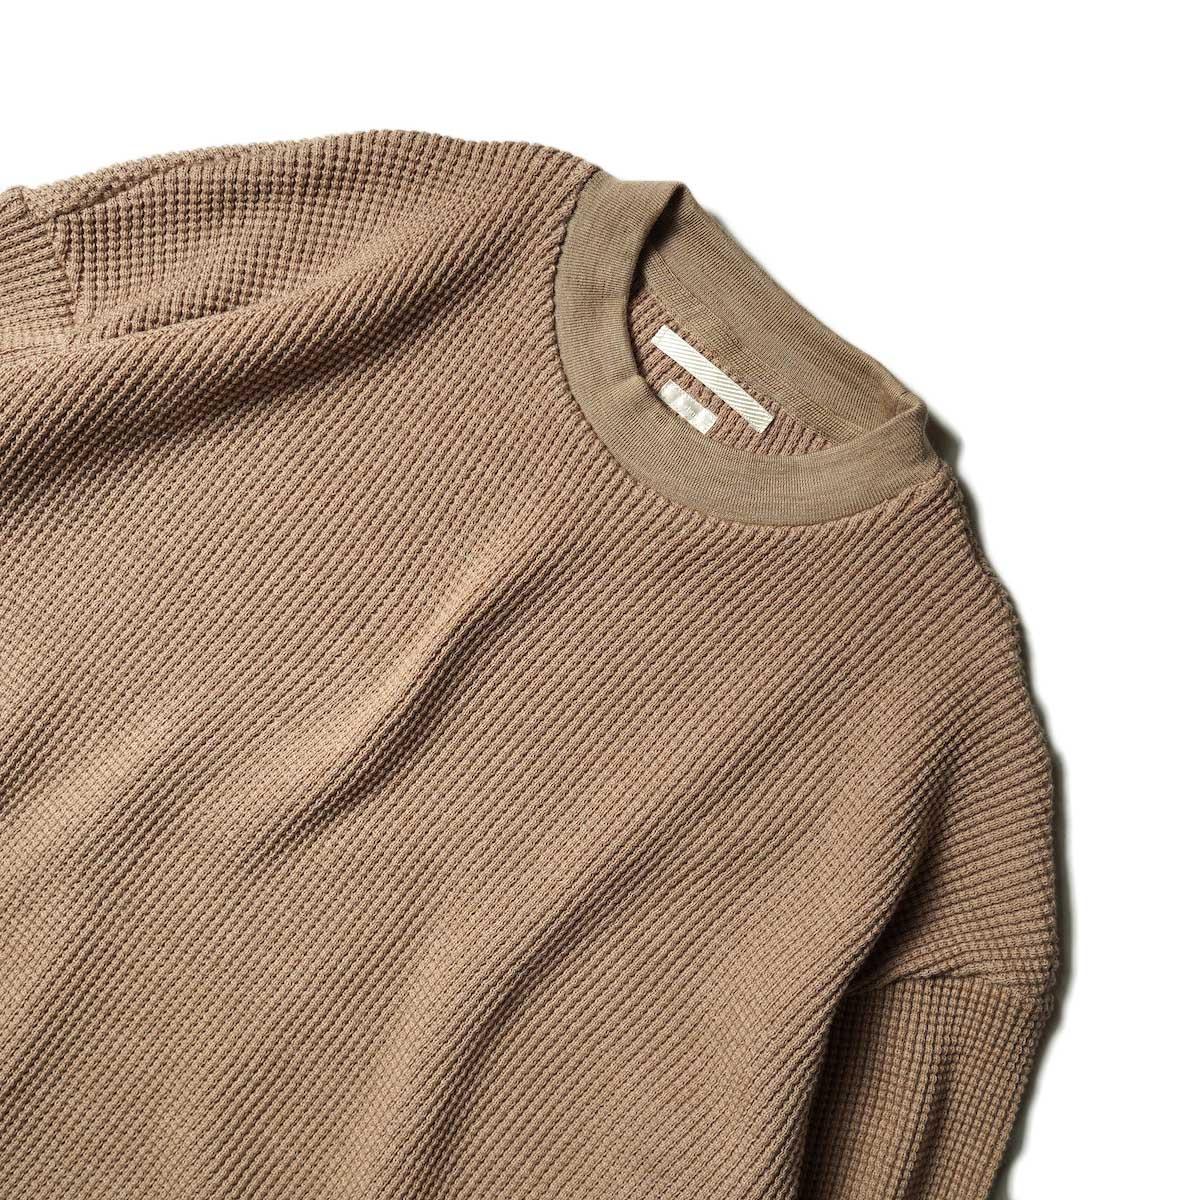 blurhms / Wool Cotton Big Waffle Crew-Neck (Beige)ネック